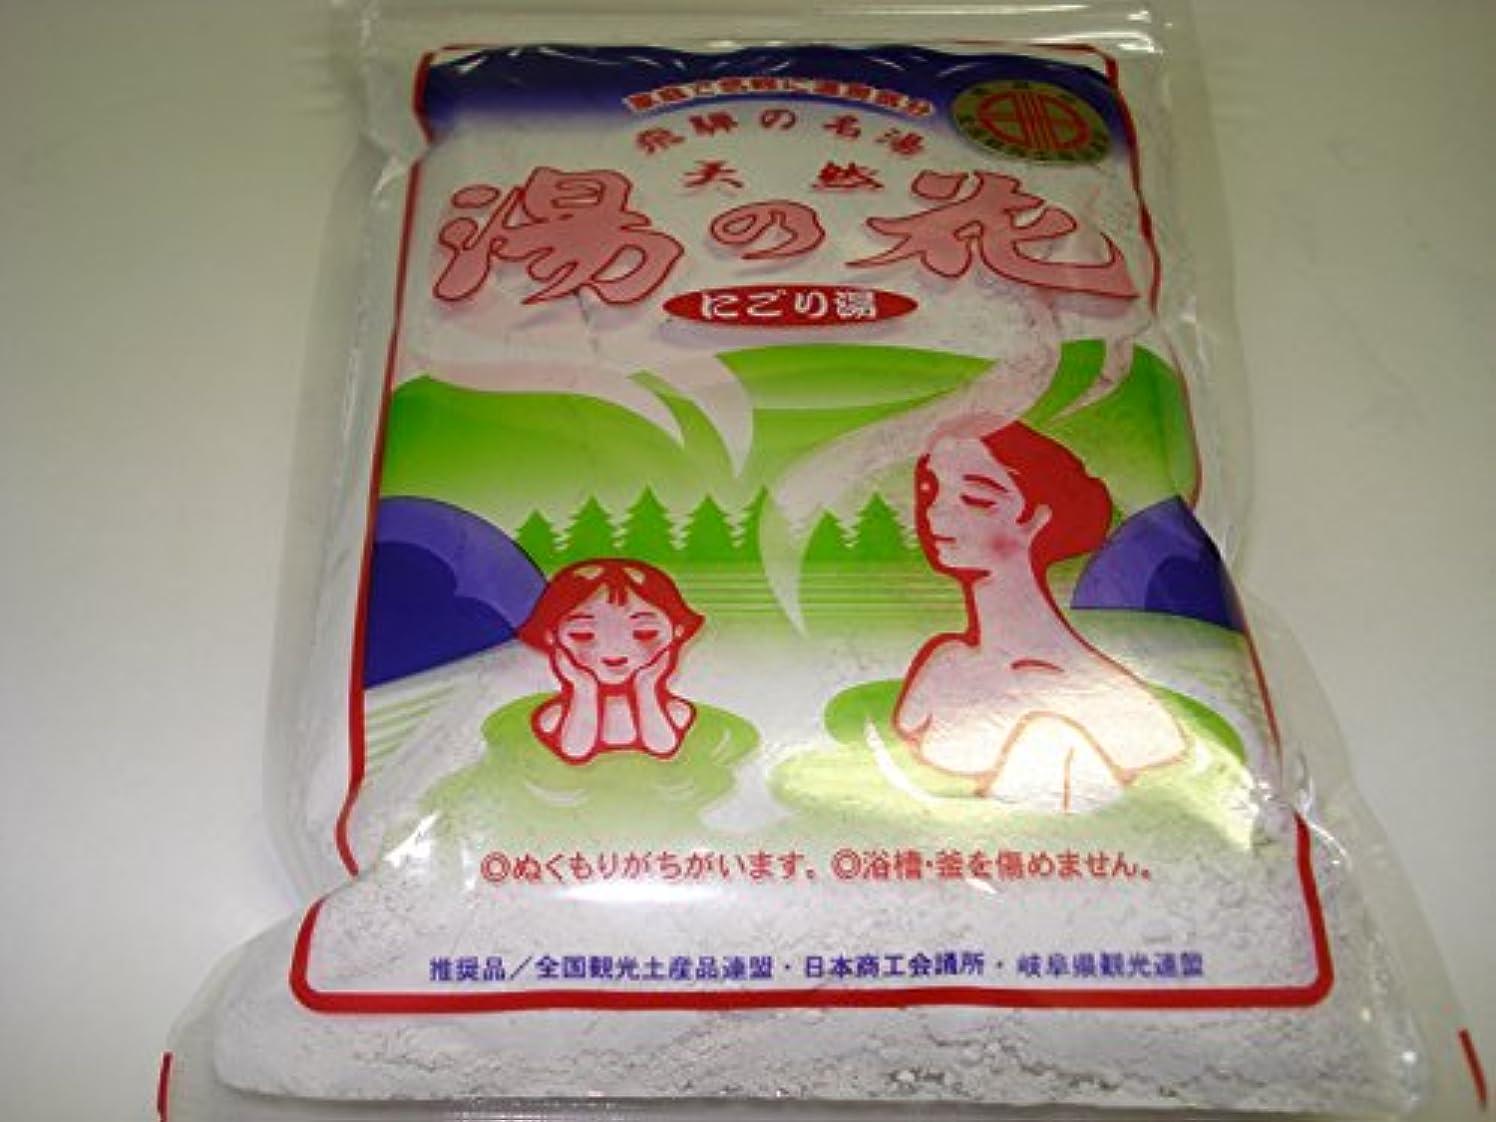 前任者カナダ不信奥飛騨天然湯の花 徳用袋(250g)